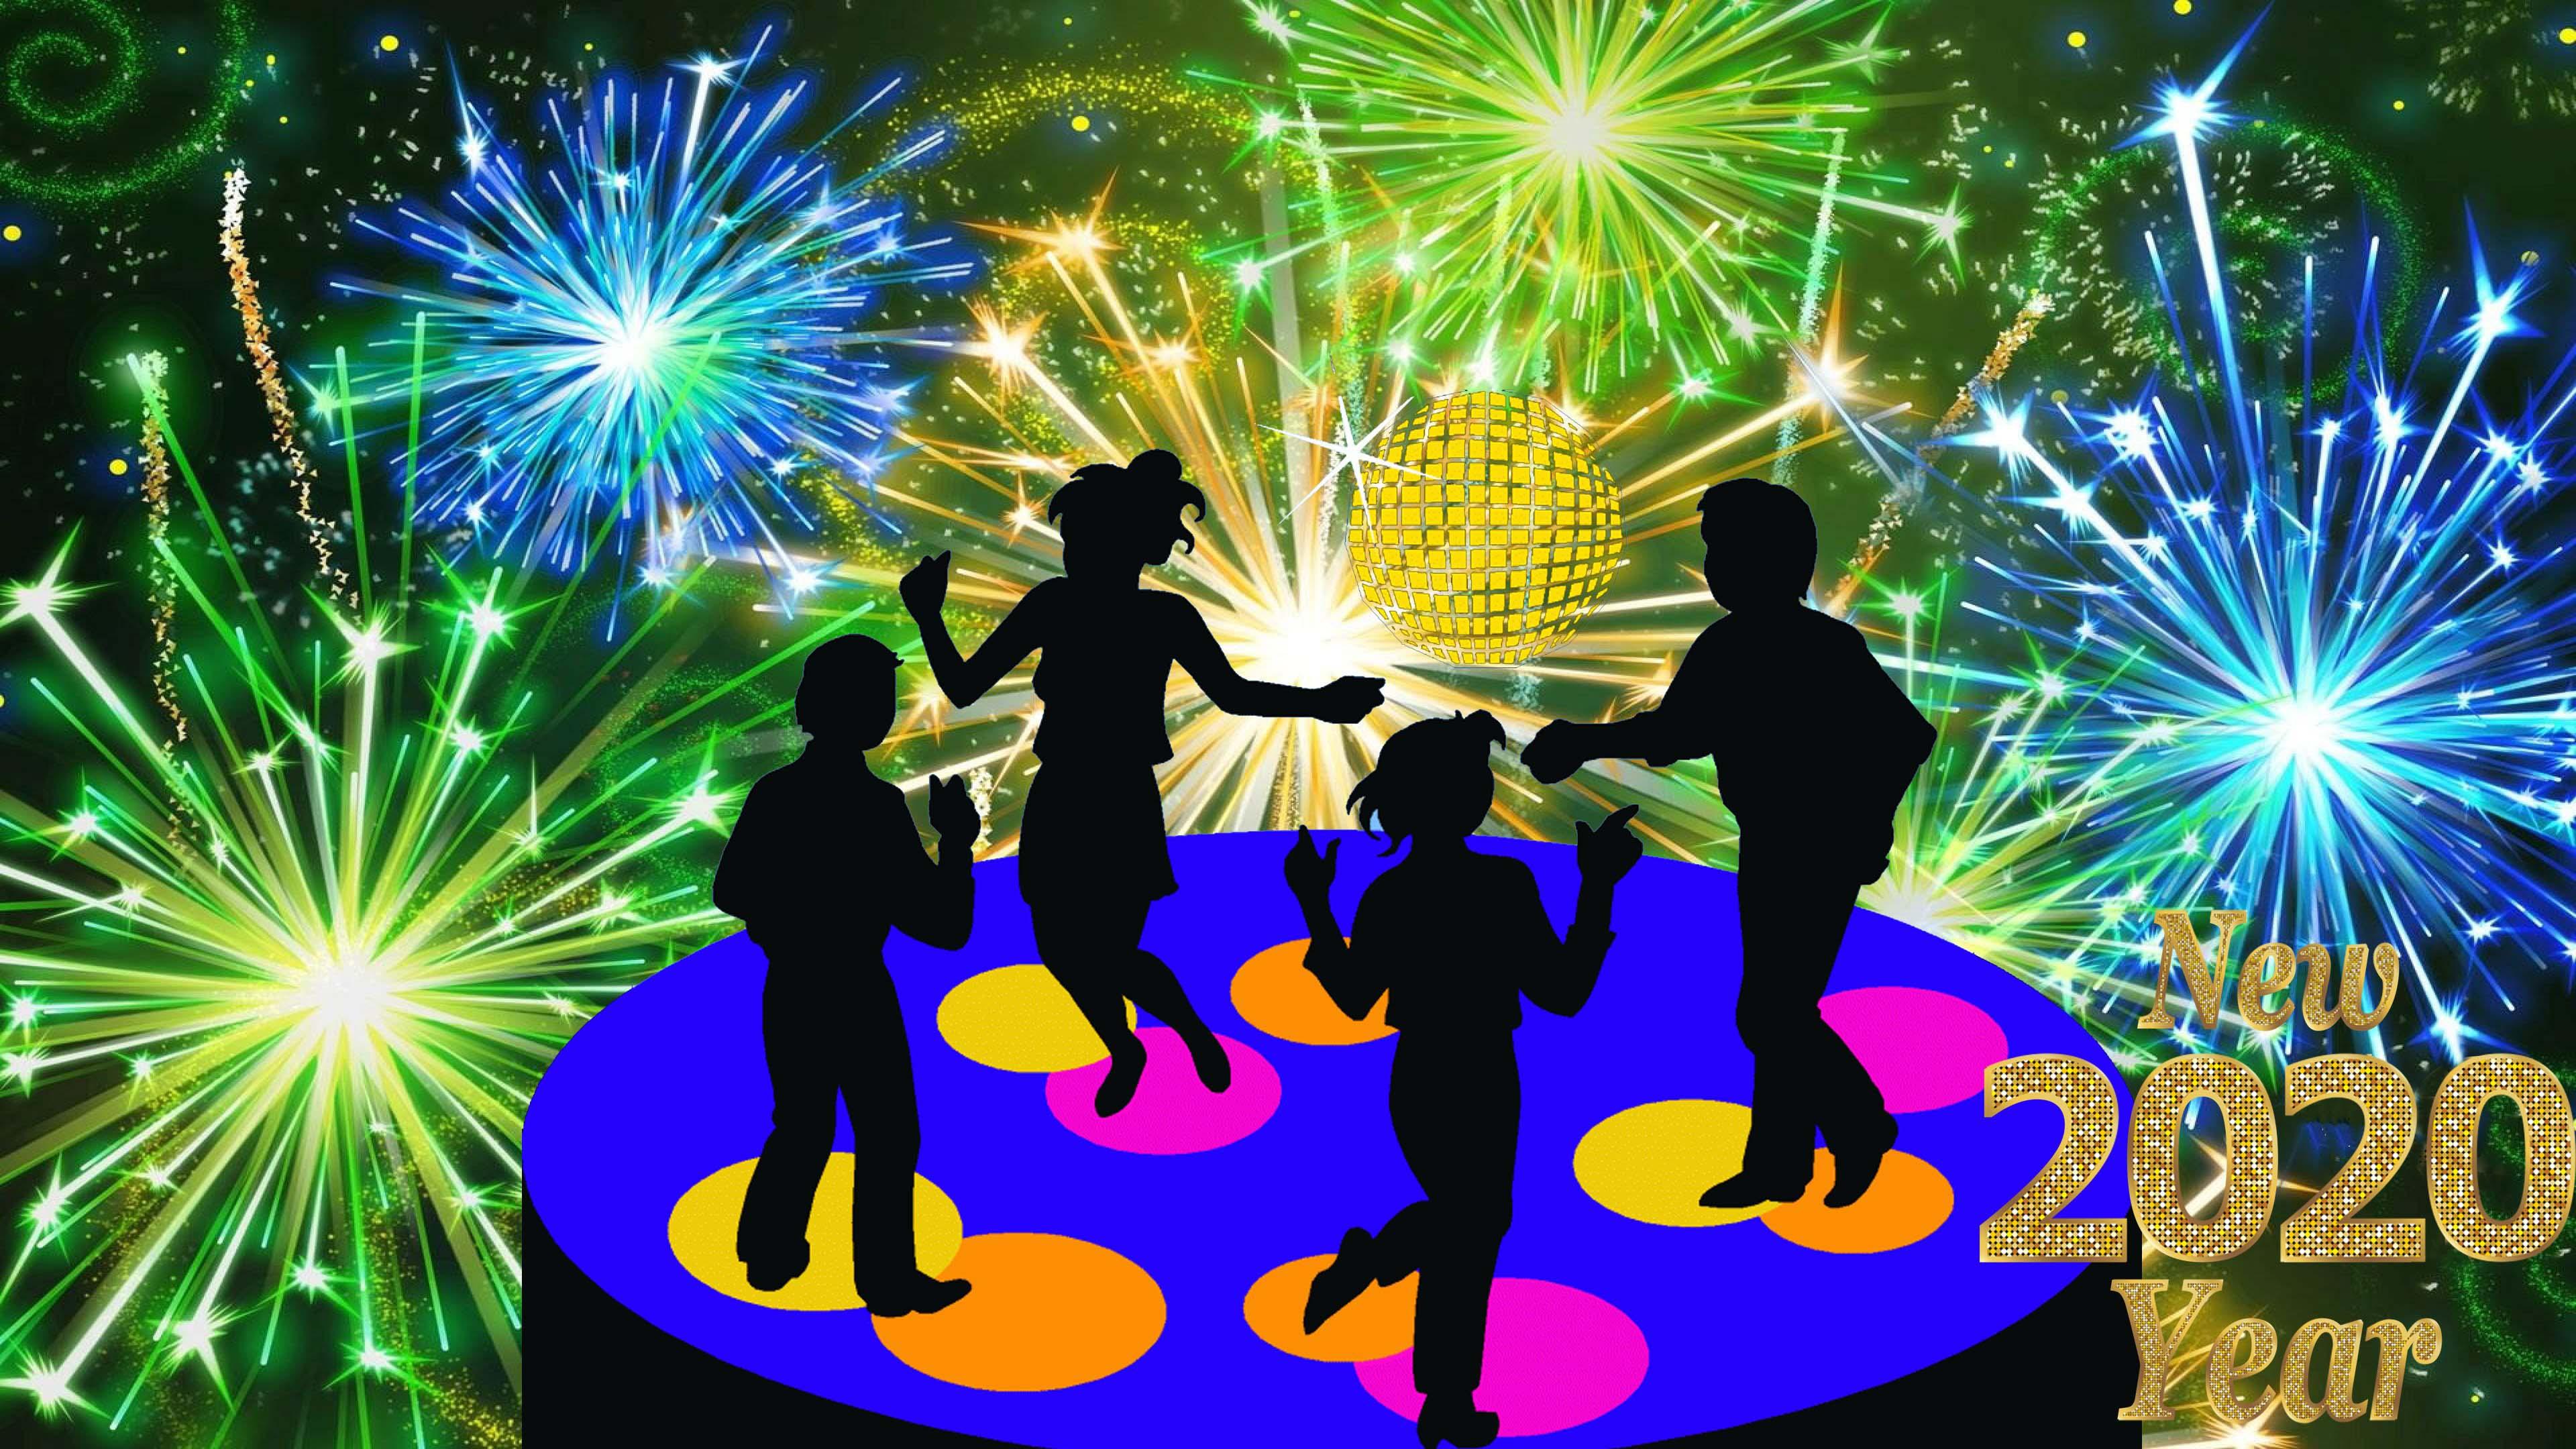 New Years Eve 2020 Disco Music Dancing Celebration Fireworks 3840x2160